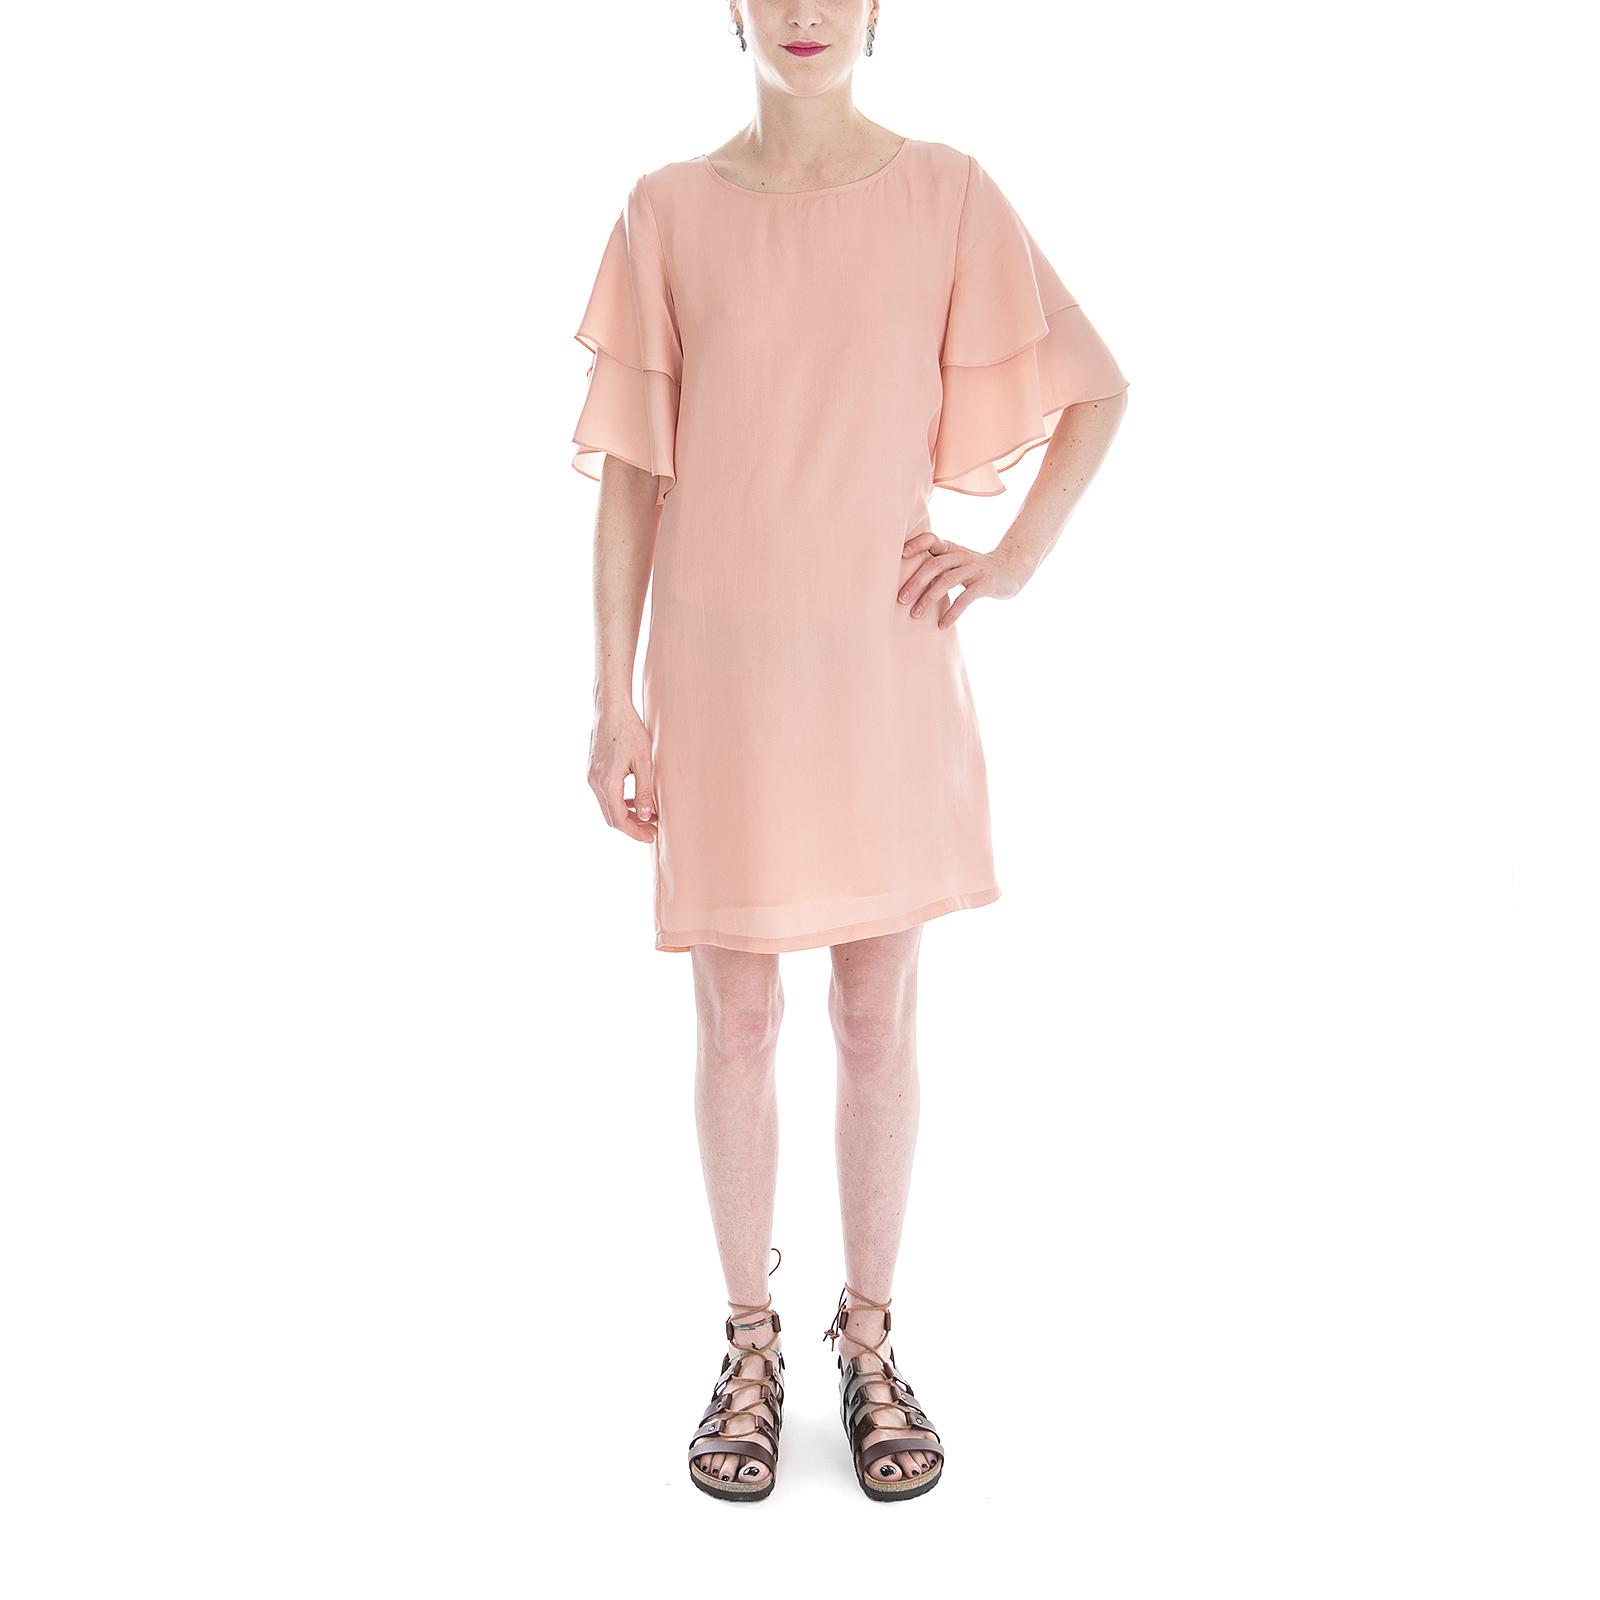 Minimum Kleidung Erla 0050 Dusty Rosa Rosa